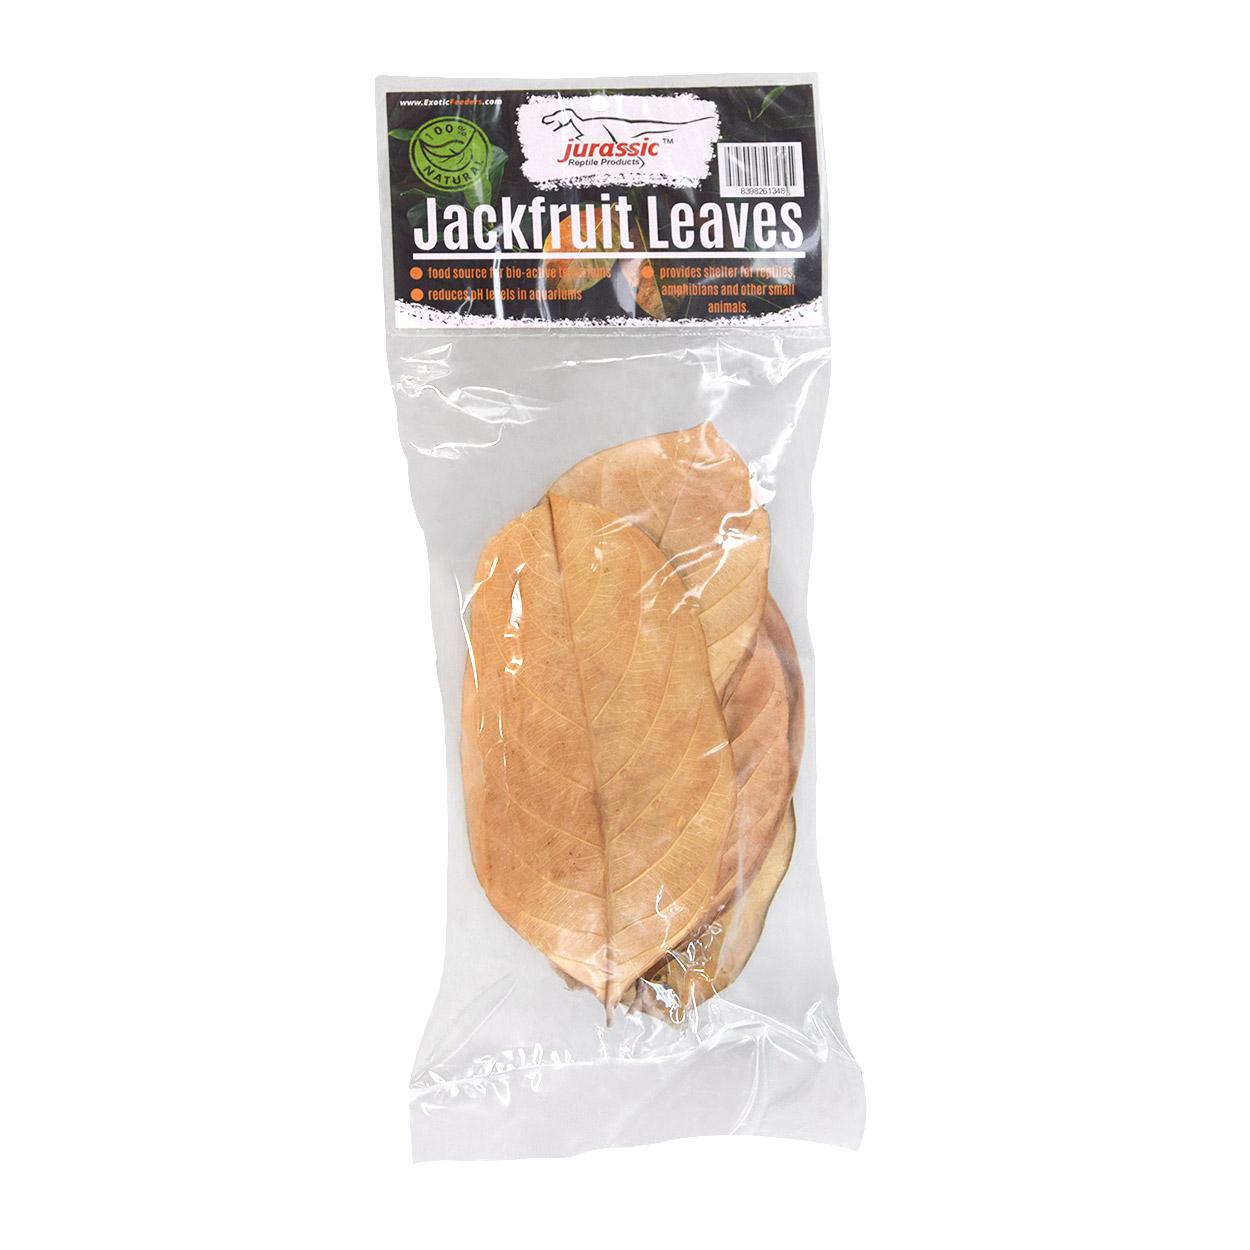 Jurassic Reptile Feuilles de jacquier - Jackfruit Leaves